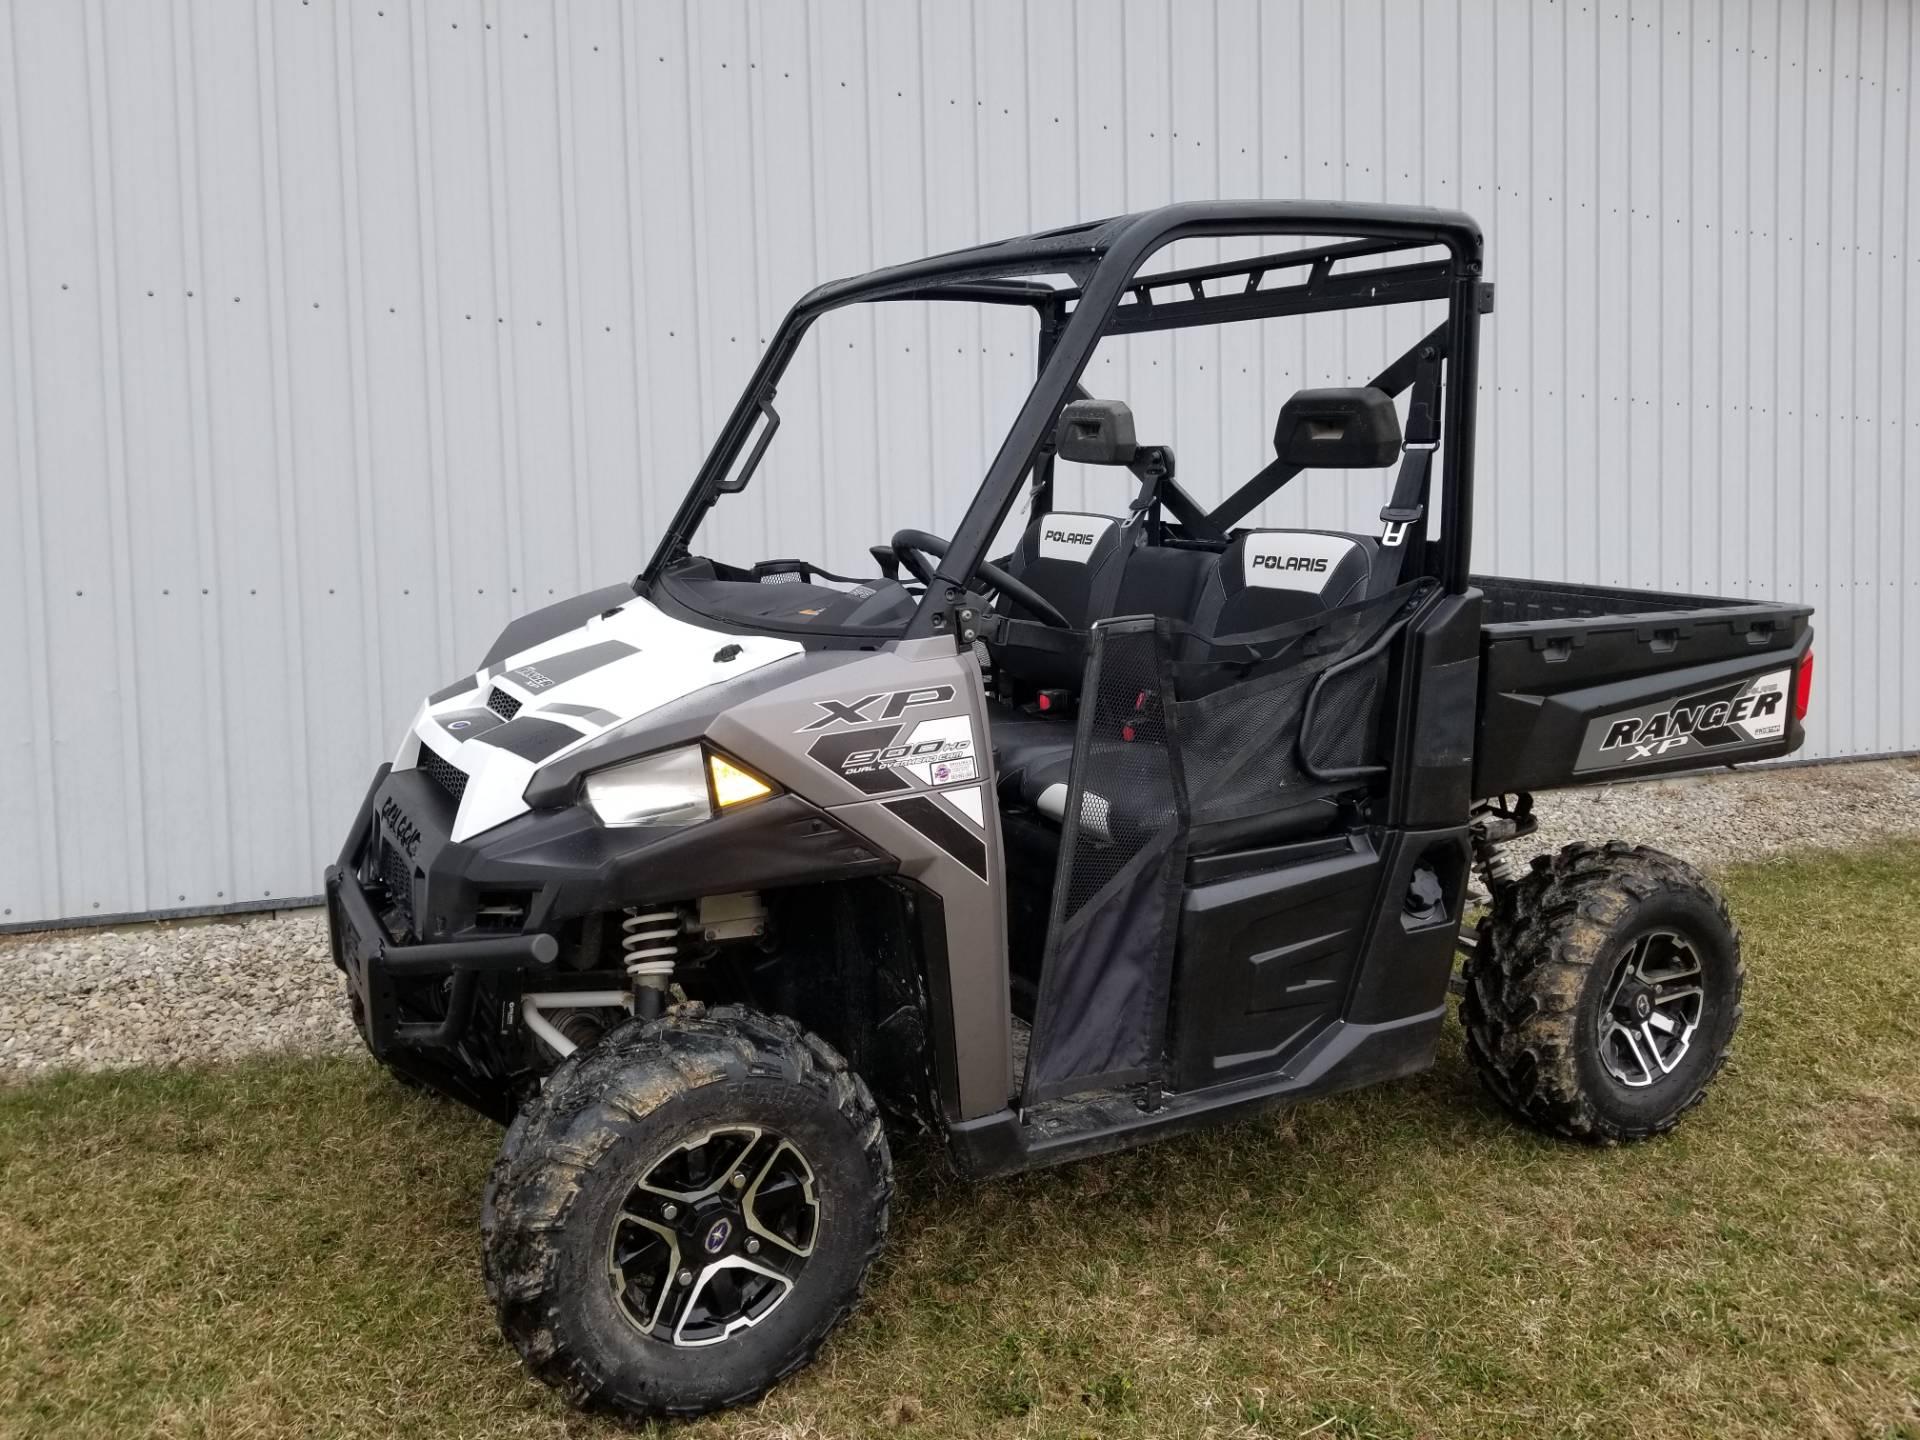 2016 Polaris Ranger Xp 900 Eps In Calmar Iowa